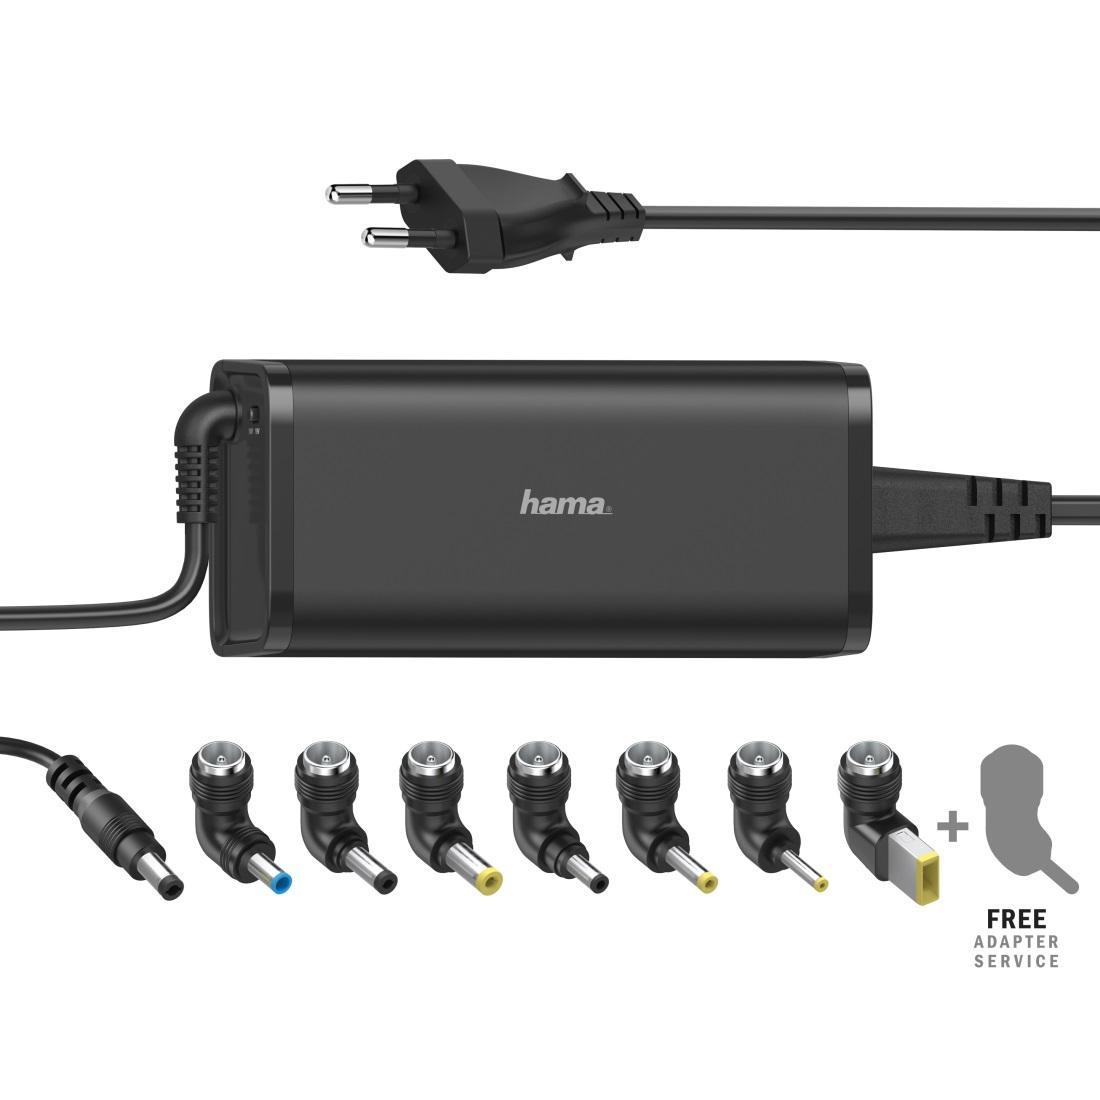 Универсално захранване за лаптоп HAMA, мрежово, вх. 100-240 V, изх. 15/19 V, 90 W